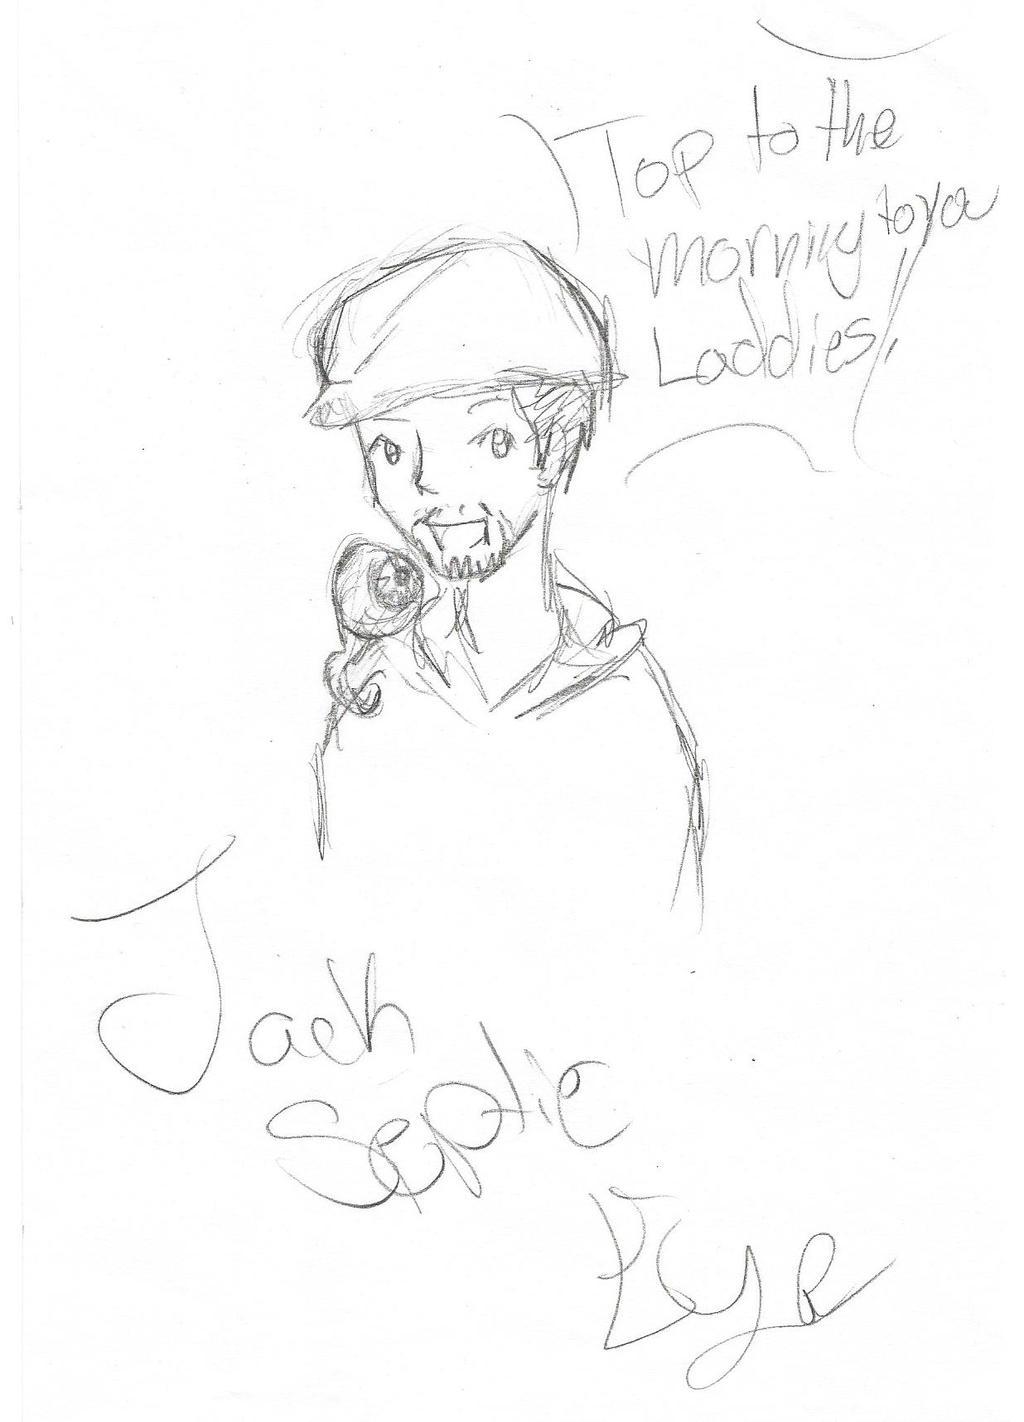 First Jacksepticeye Drawing By Demonicmutt